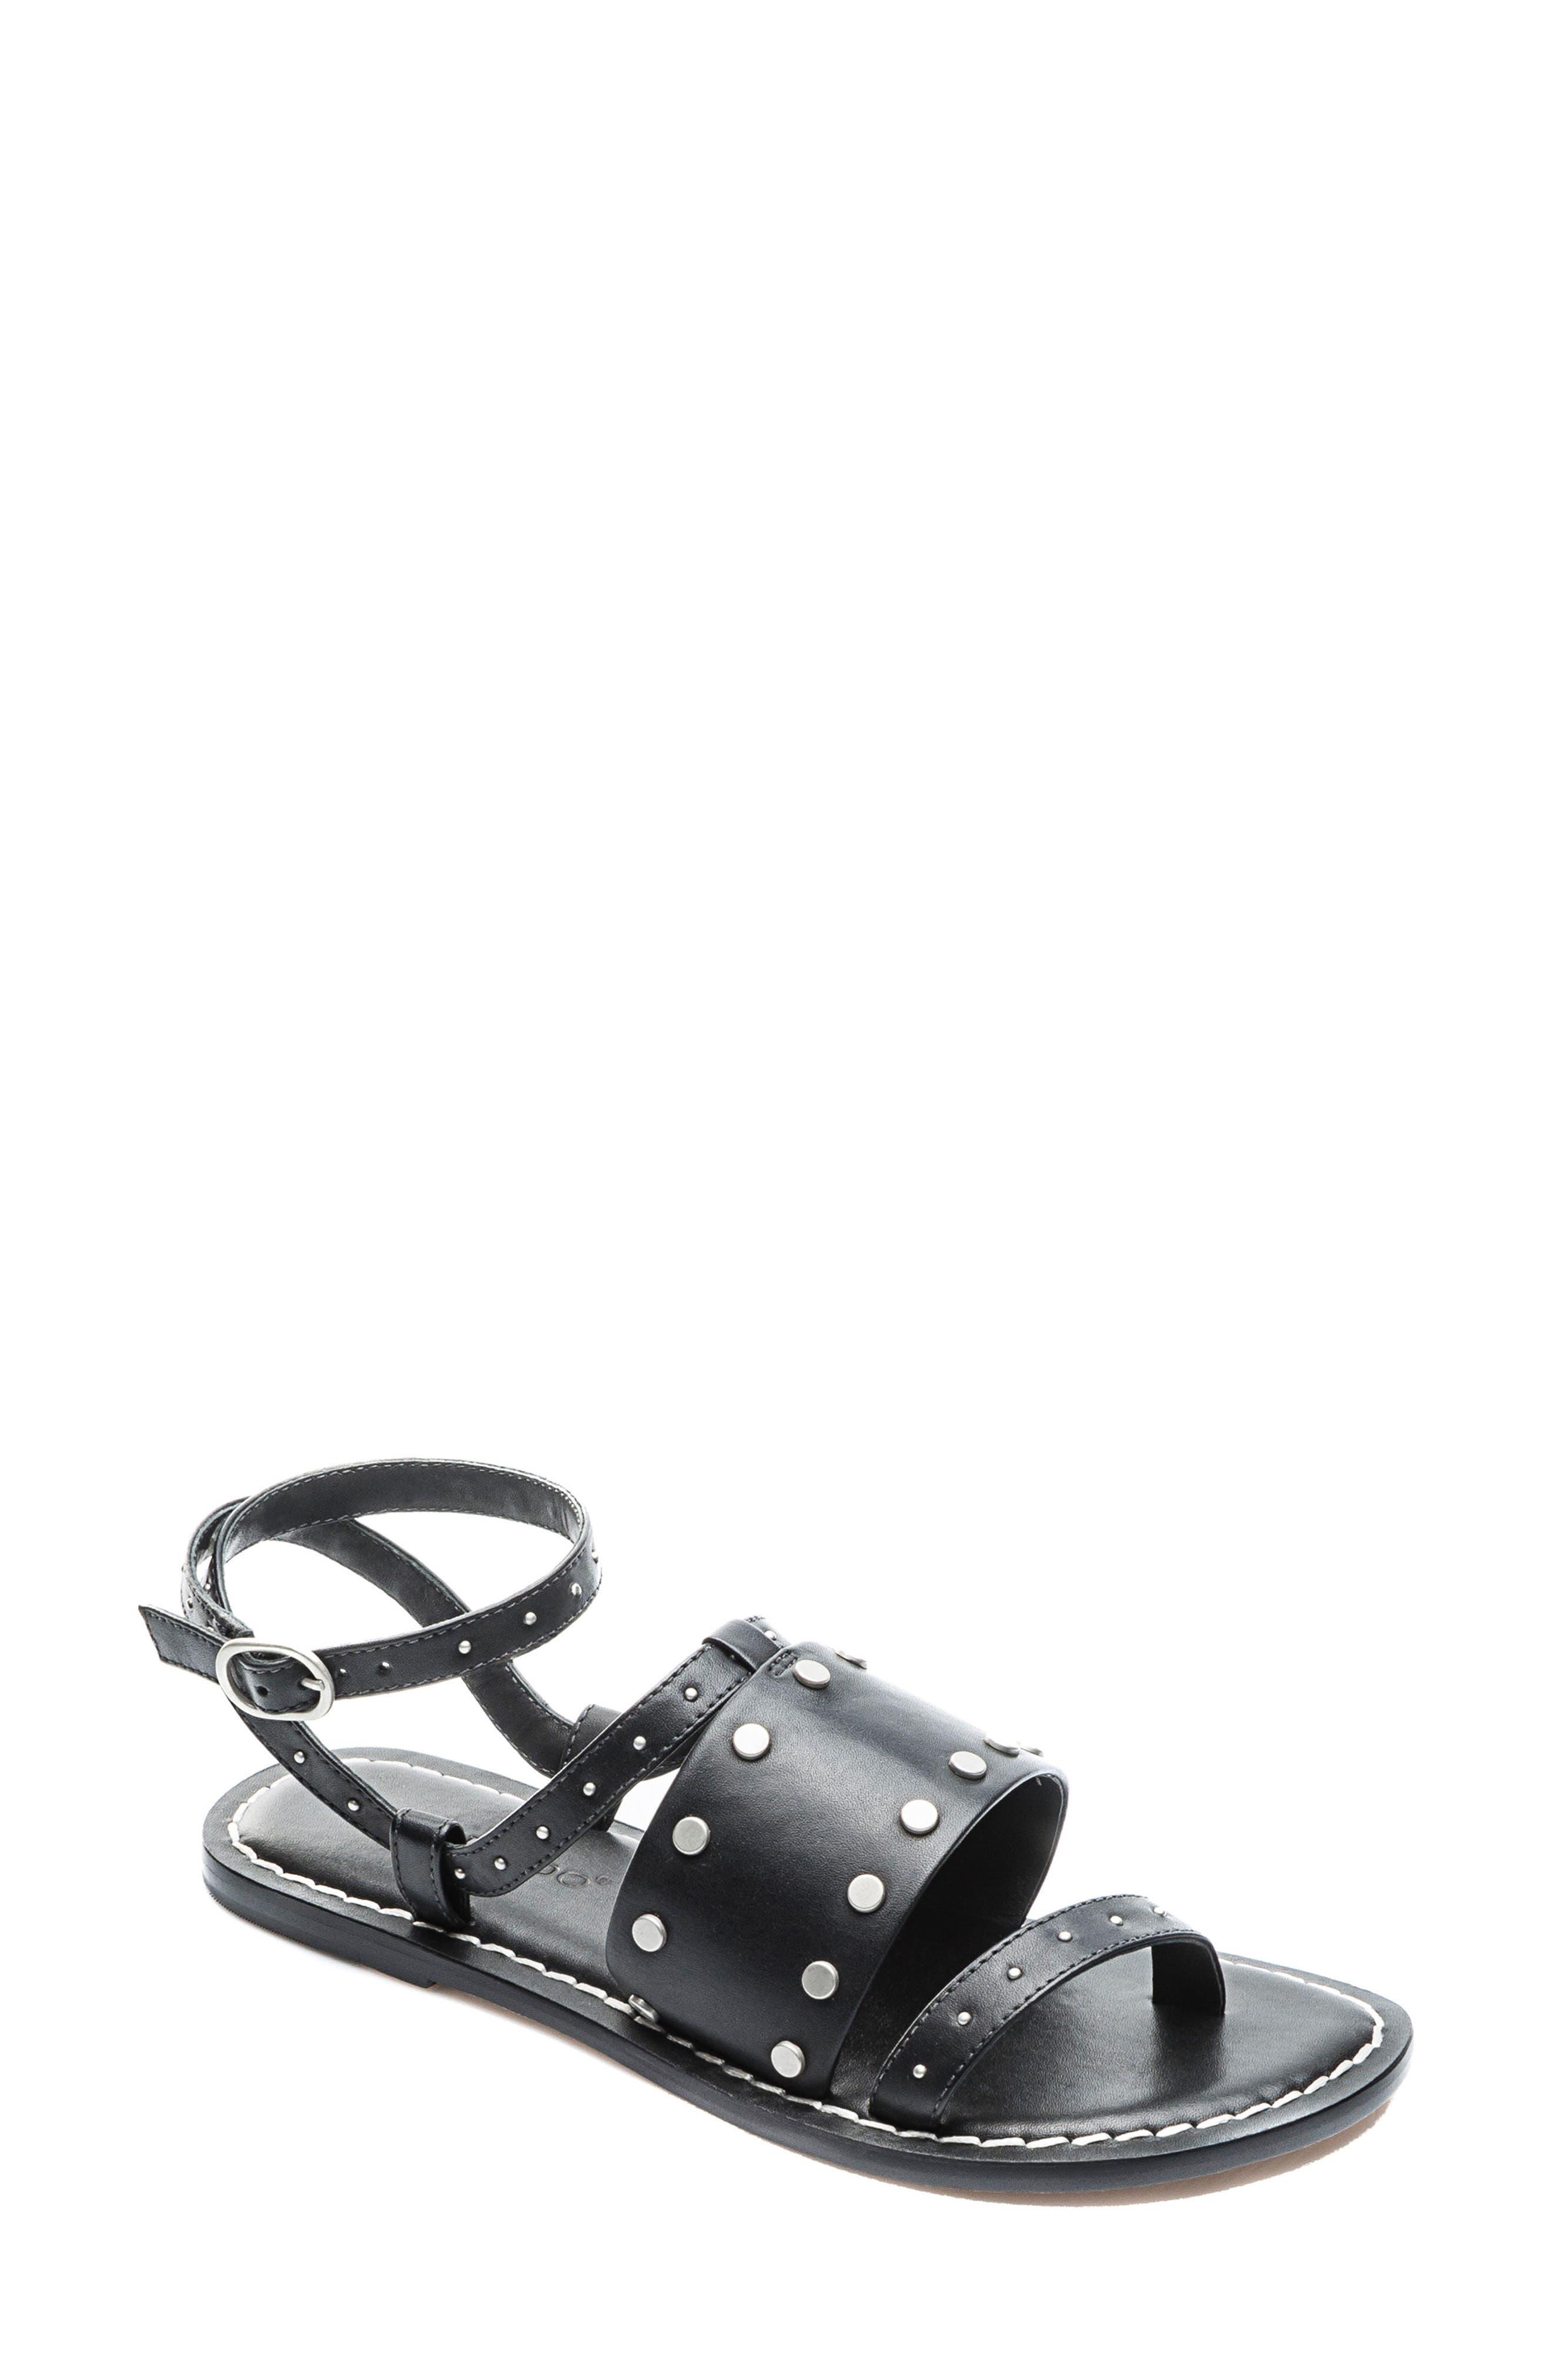 Bernardo Maisa Sandal,                             Main thumbnail 1, color,                             Black Leather